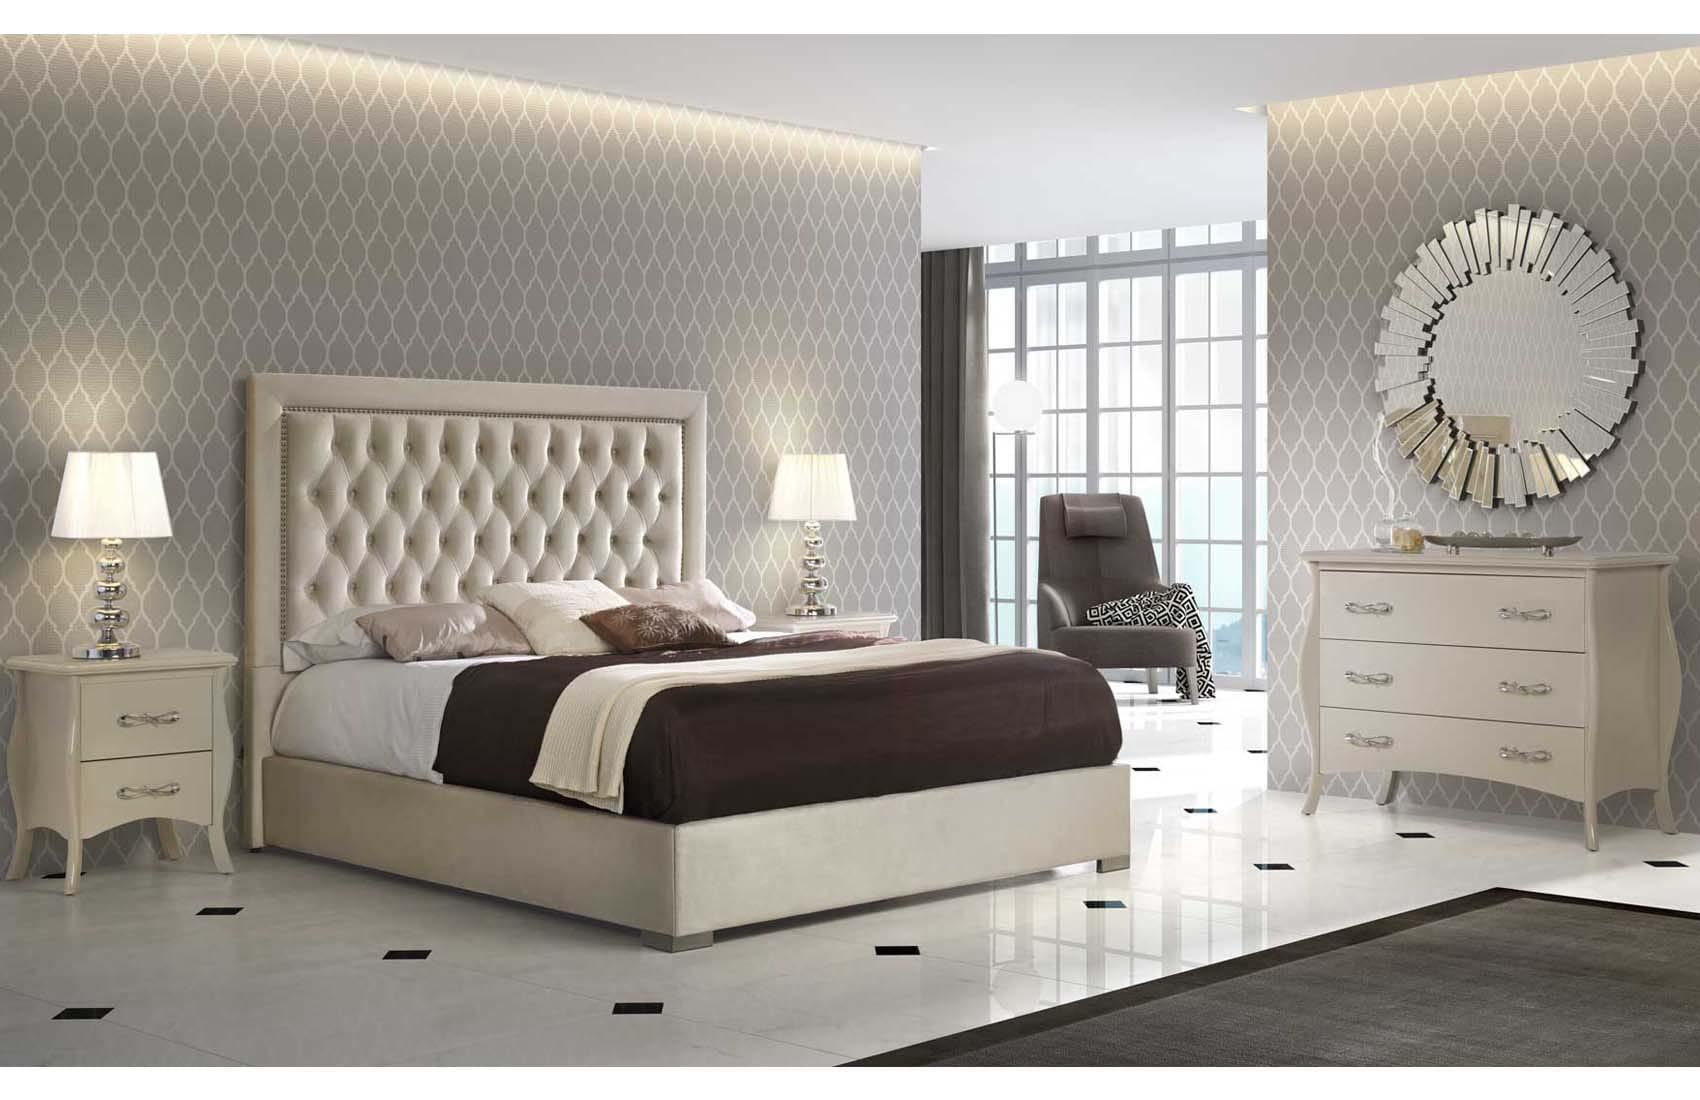 Adagio Ivory Bedroom Set by ESF